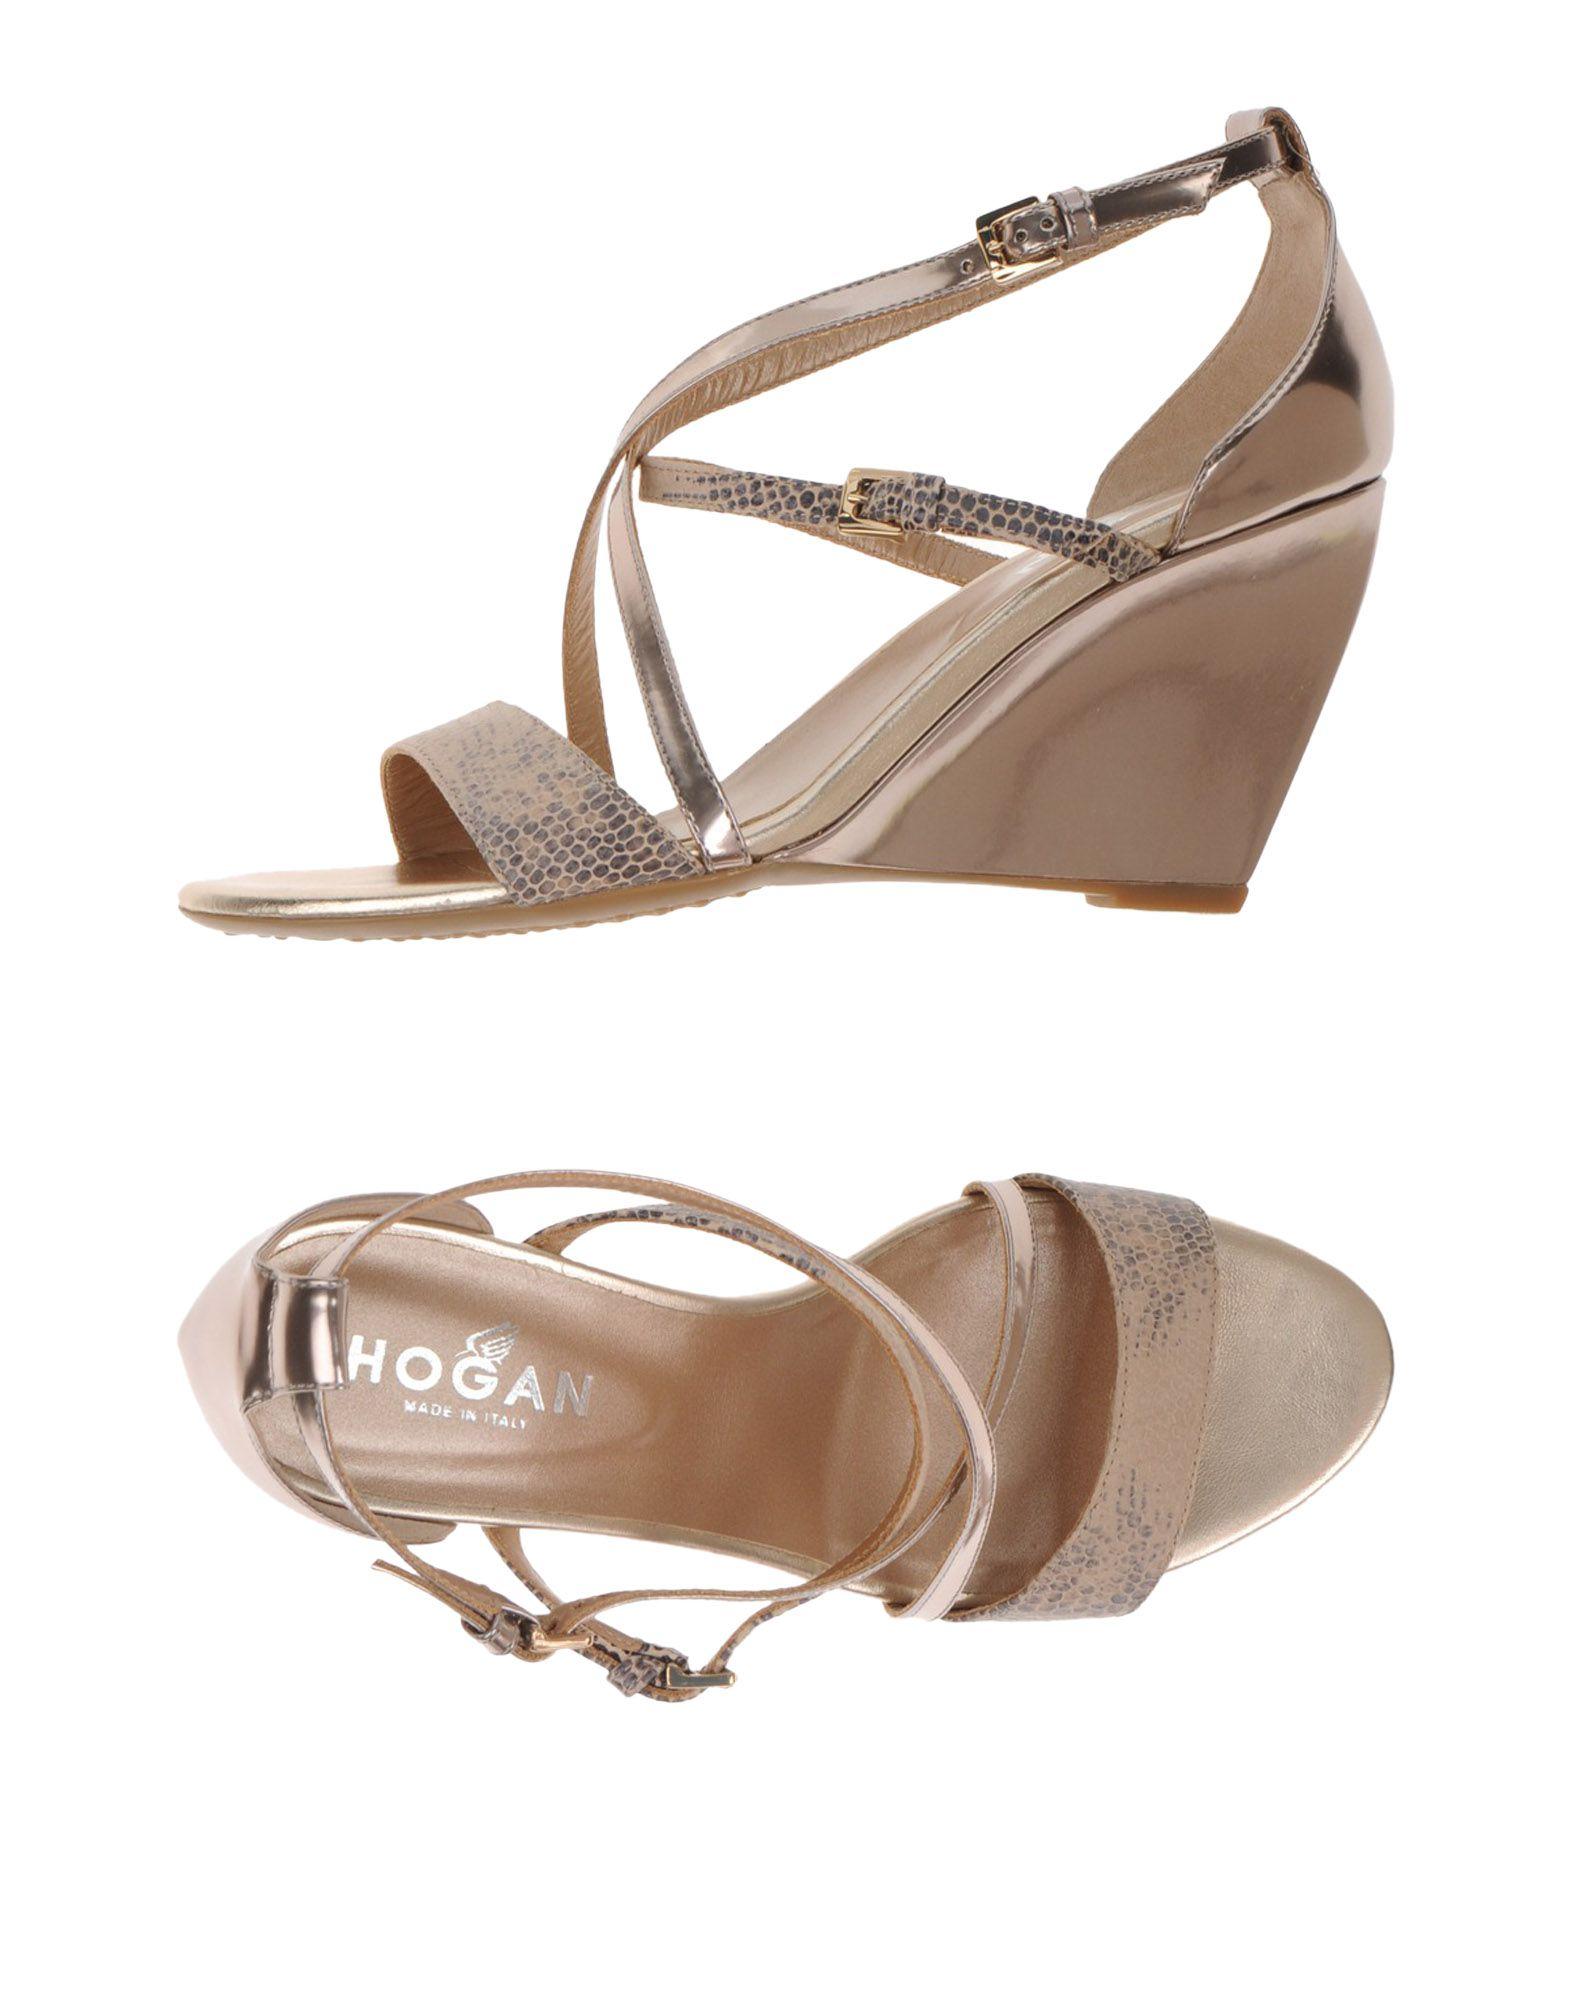 Moda Sandali Hogan Donna - 11382517DK